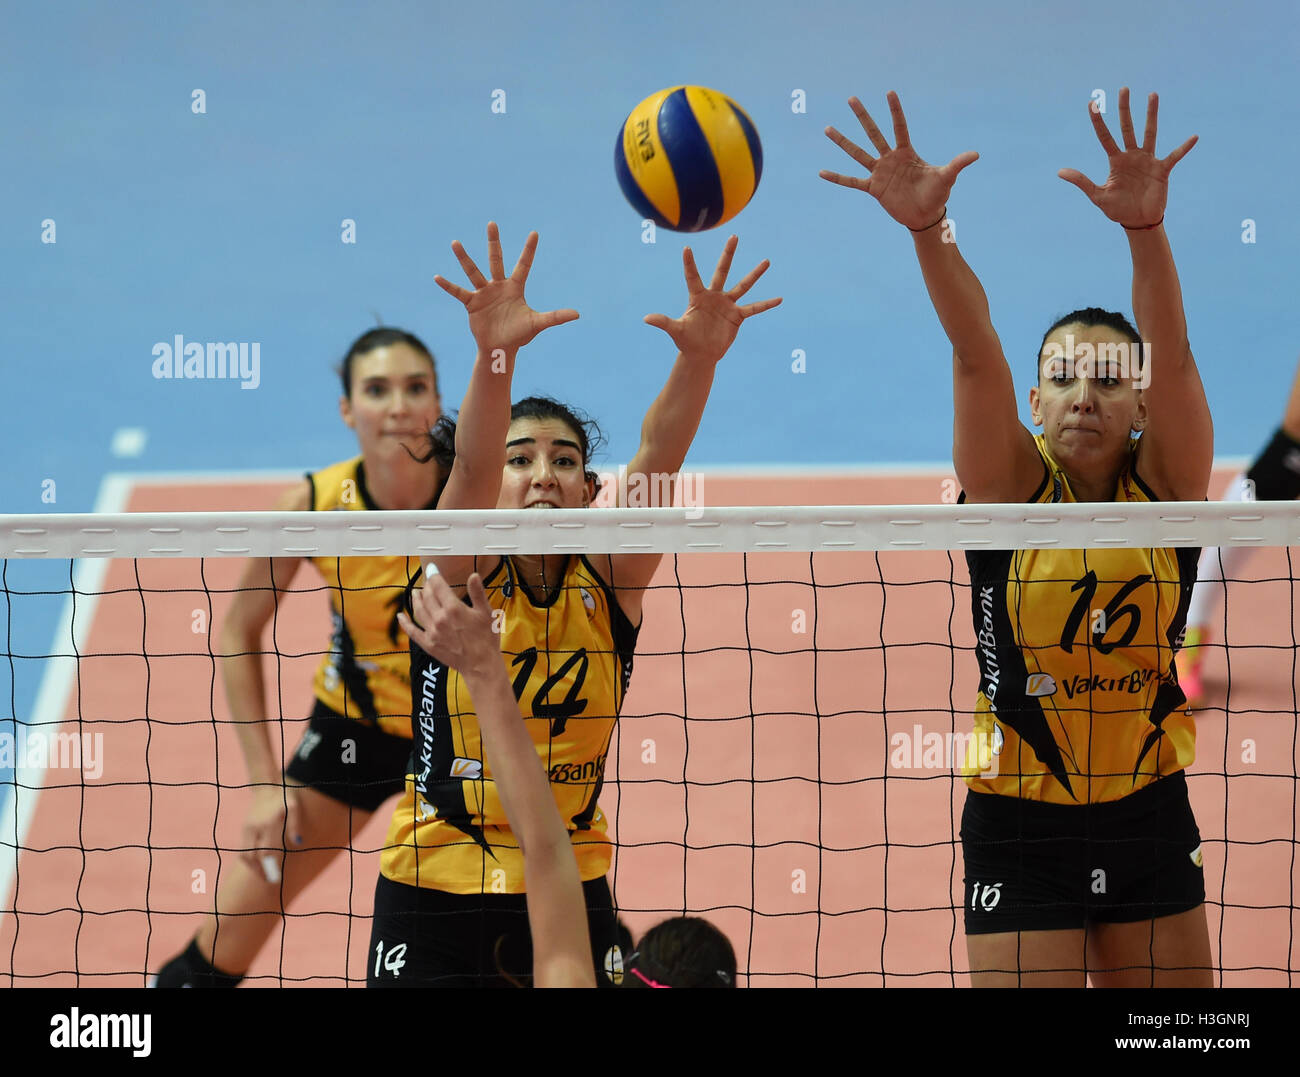 (161009)--ISTANBUL, 9. Okt., 2016(Xinhua)--Vakifbank Player Milena Rasic (R) und Melis Durul blockieren den Ball Stockfoto